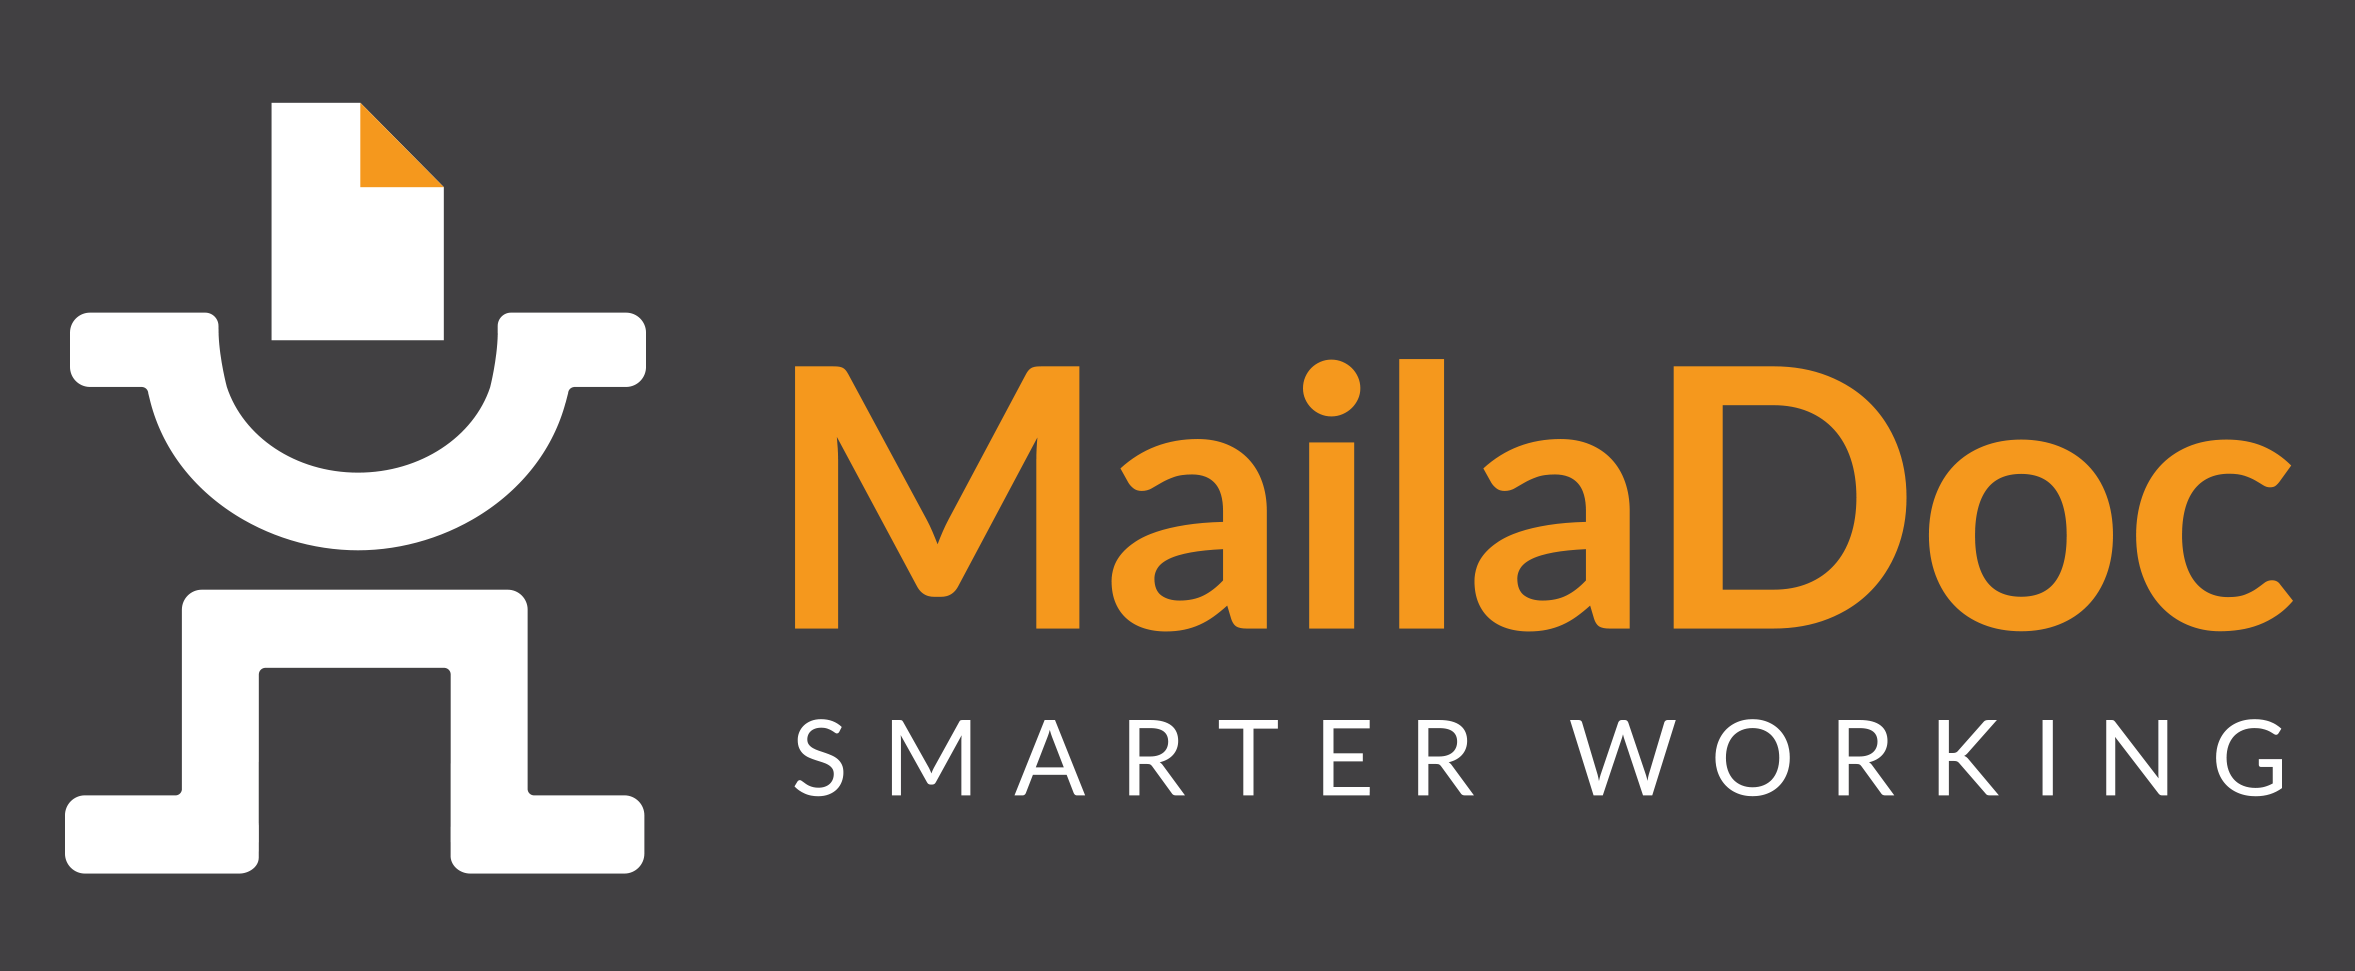 Mailadoc Logo.png